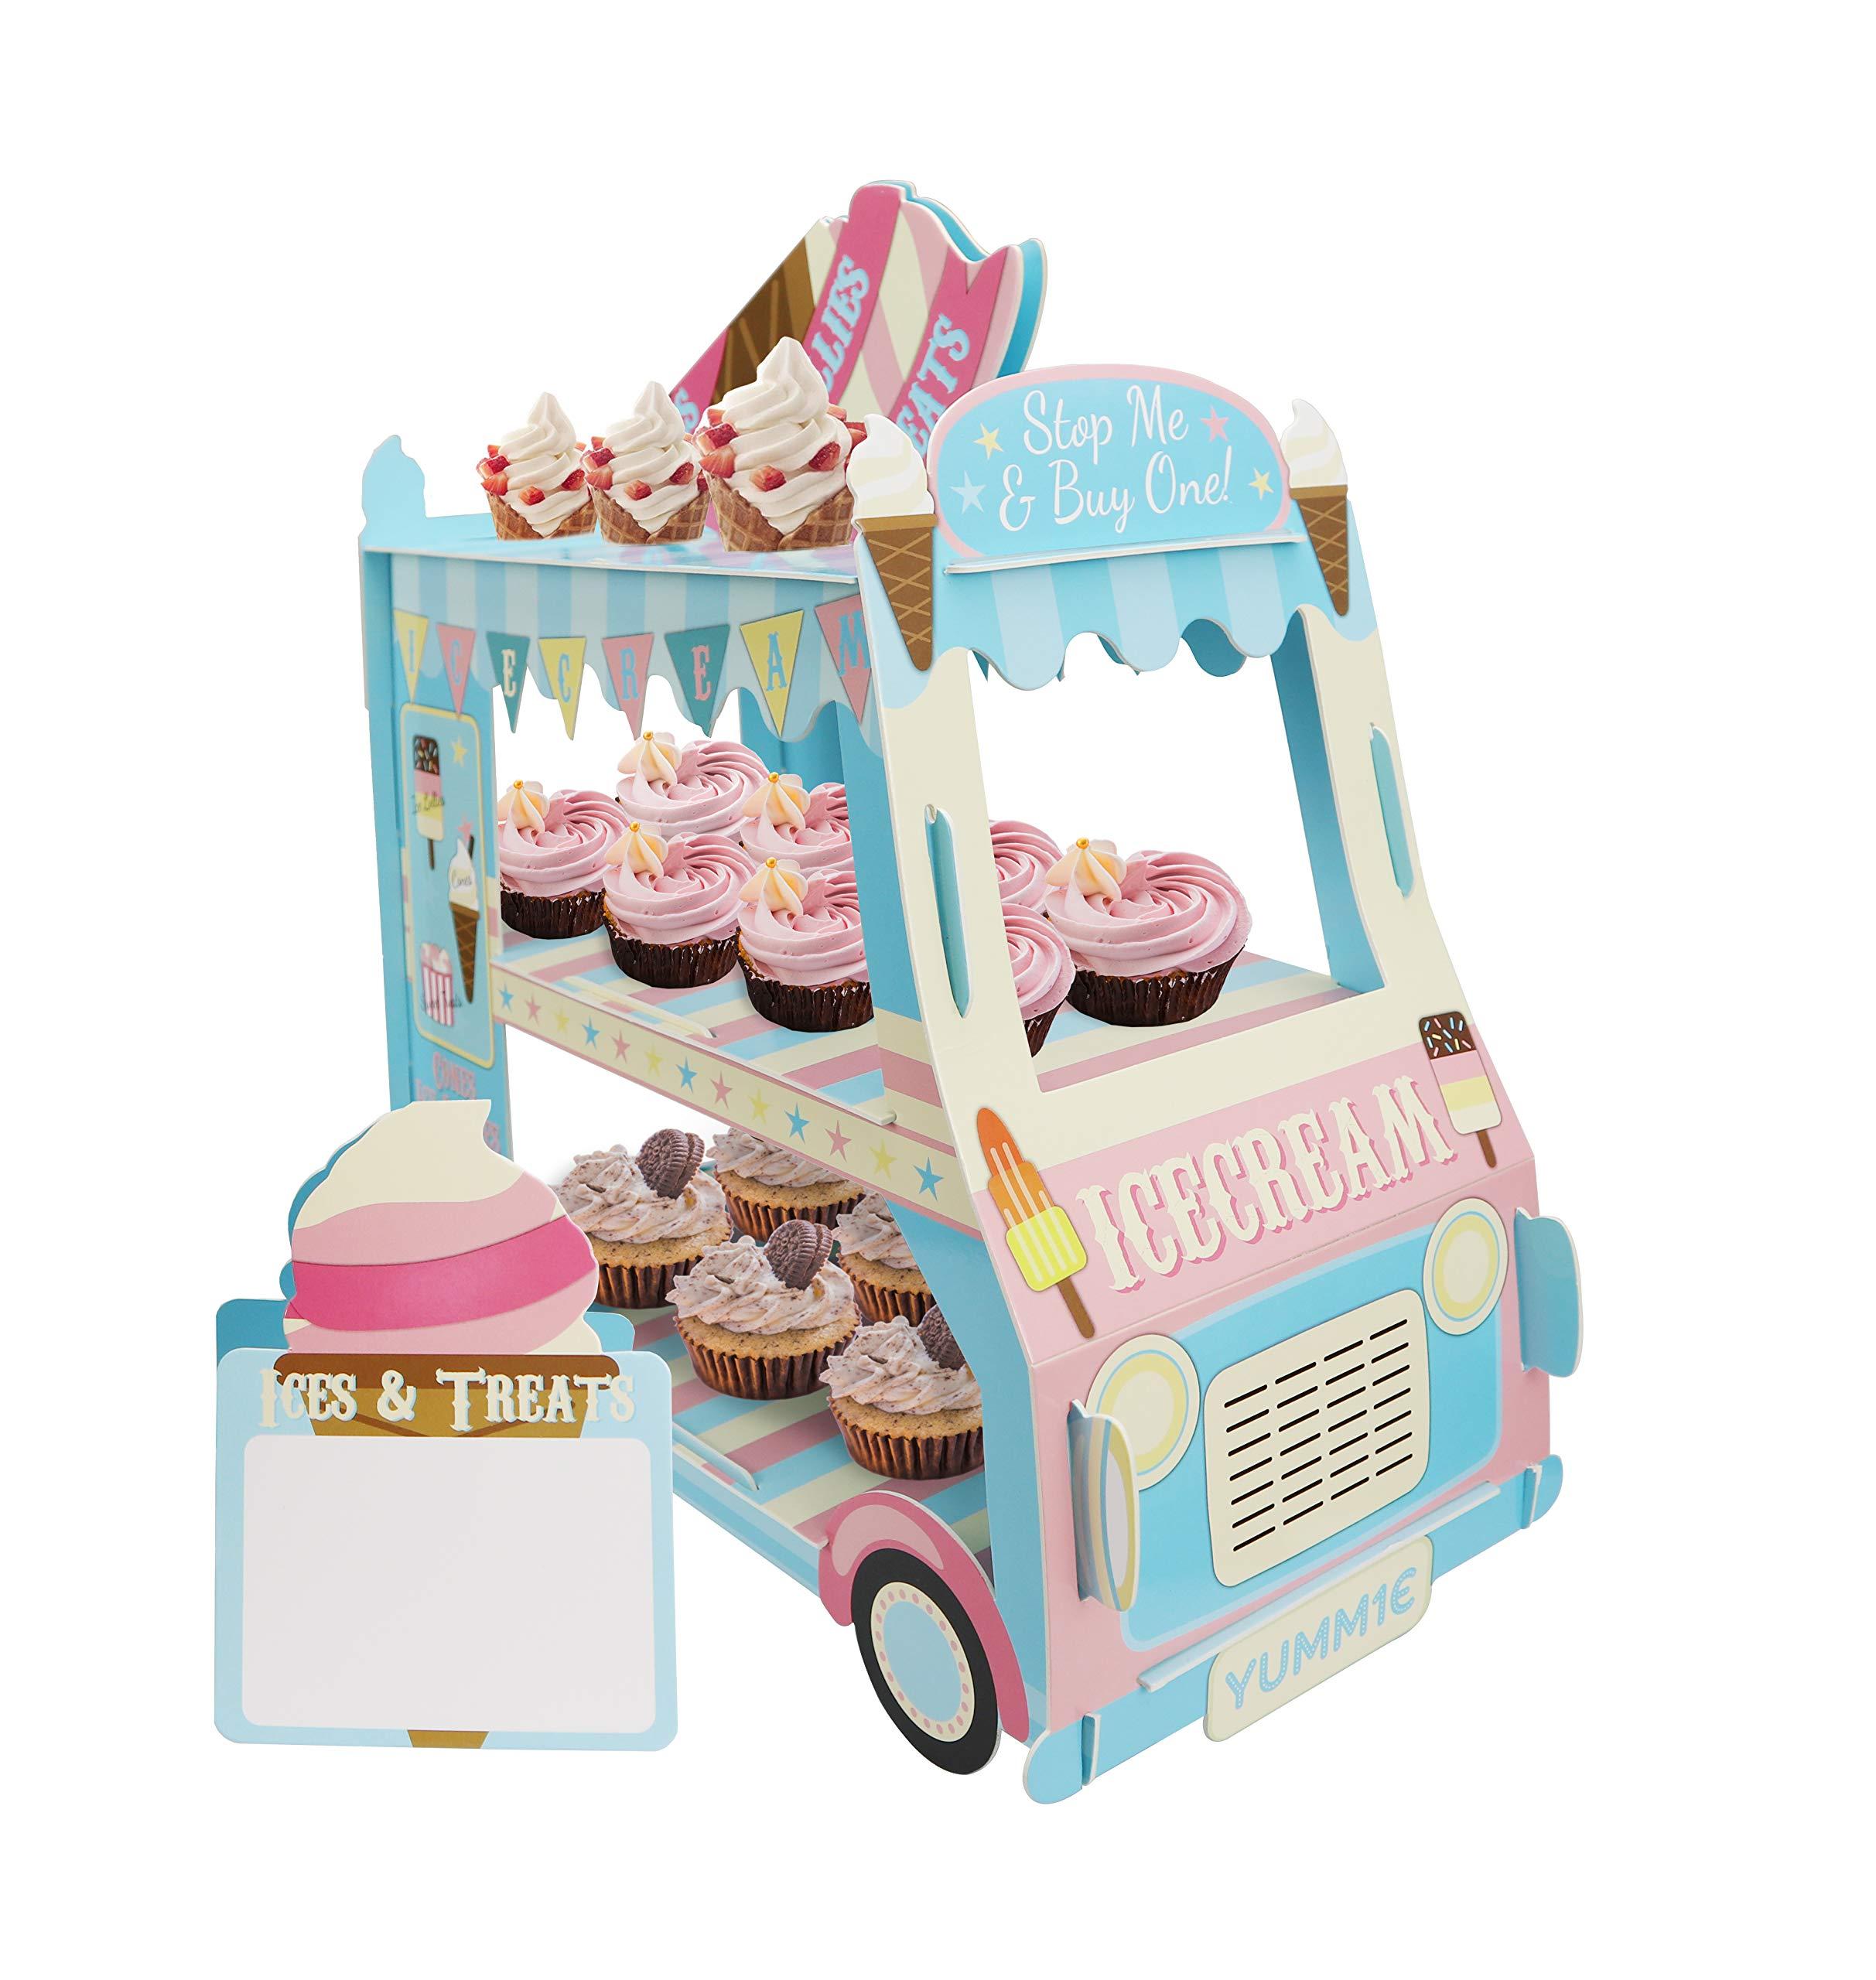 KAPOKKU 3 Tier Cupcake Stand Ice Cream Van Stand Cars Display StandCar Cupcake Cake Stand Paper Cupcake Holder for Theme Kids Birthday Party,Paper (Car Van stand cupcake holder)